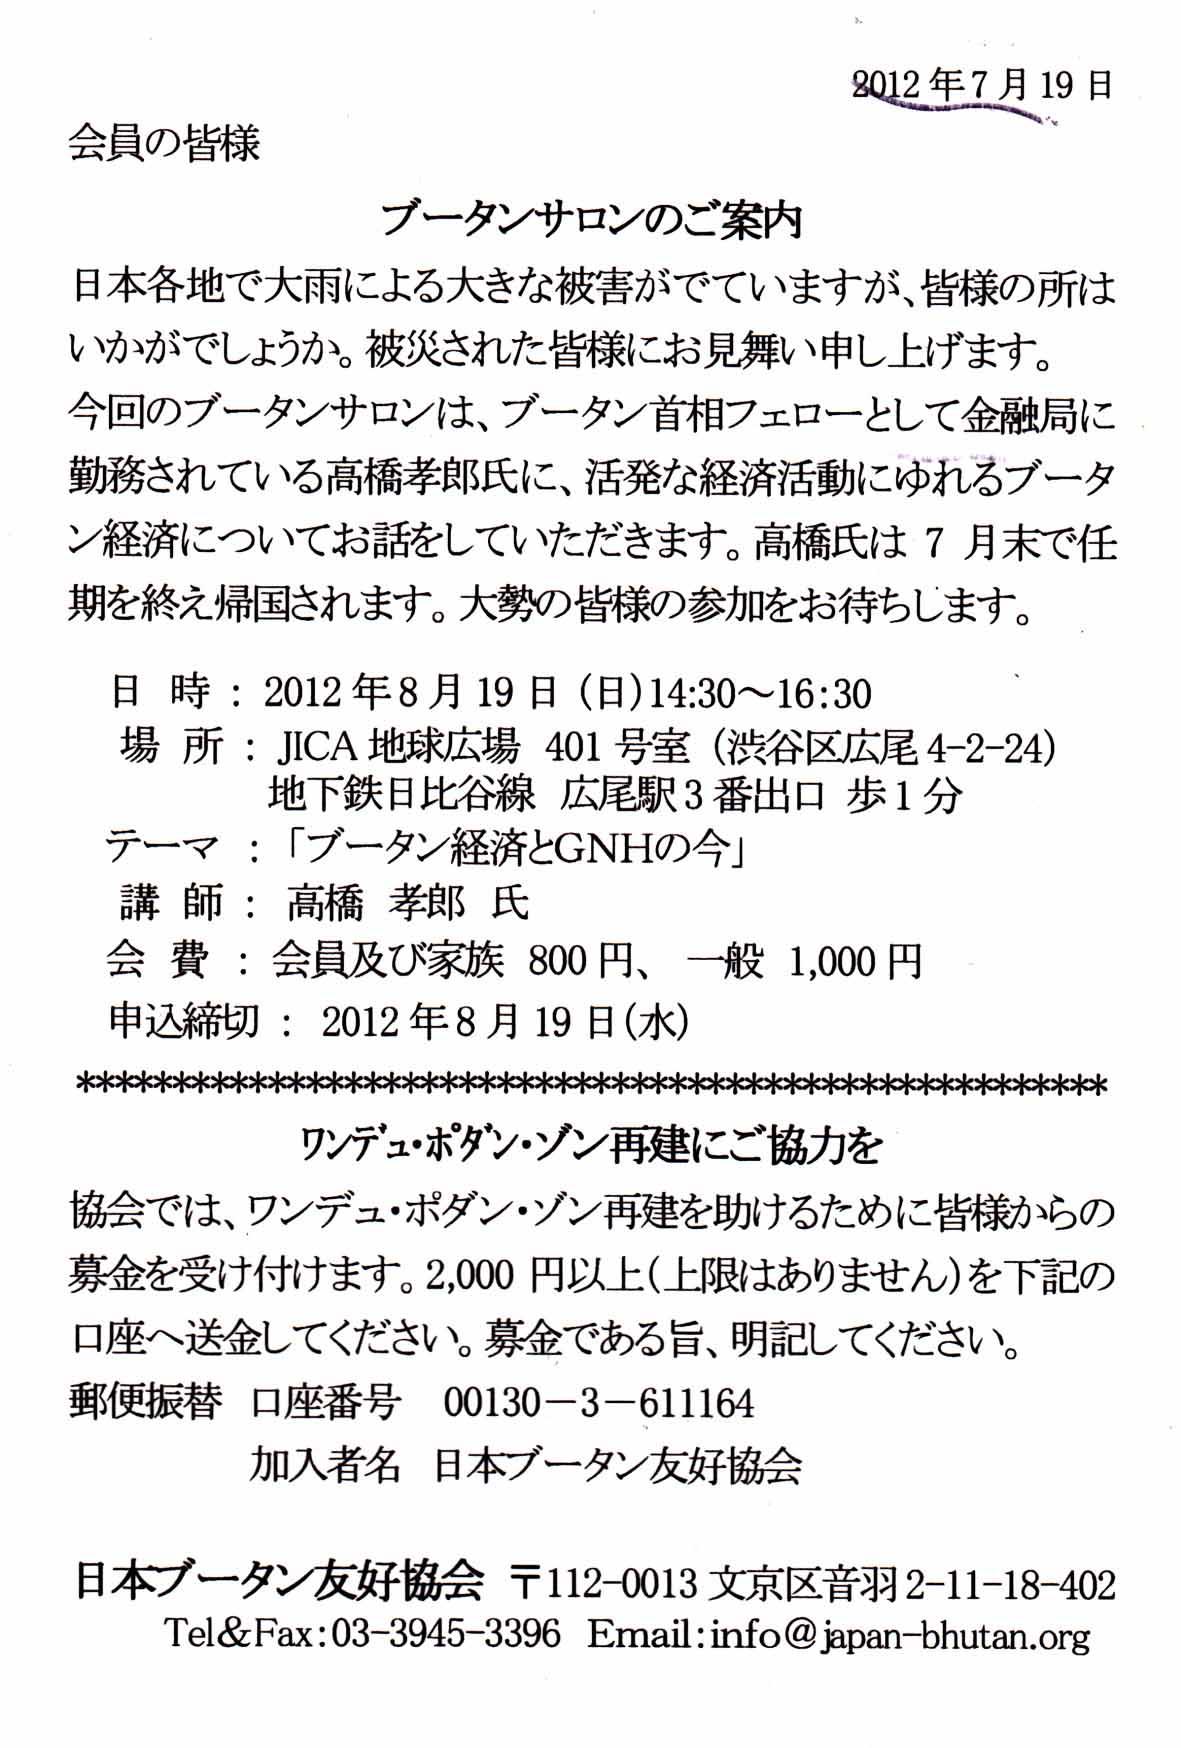 日本ブータン友好協会講演会